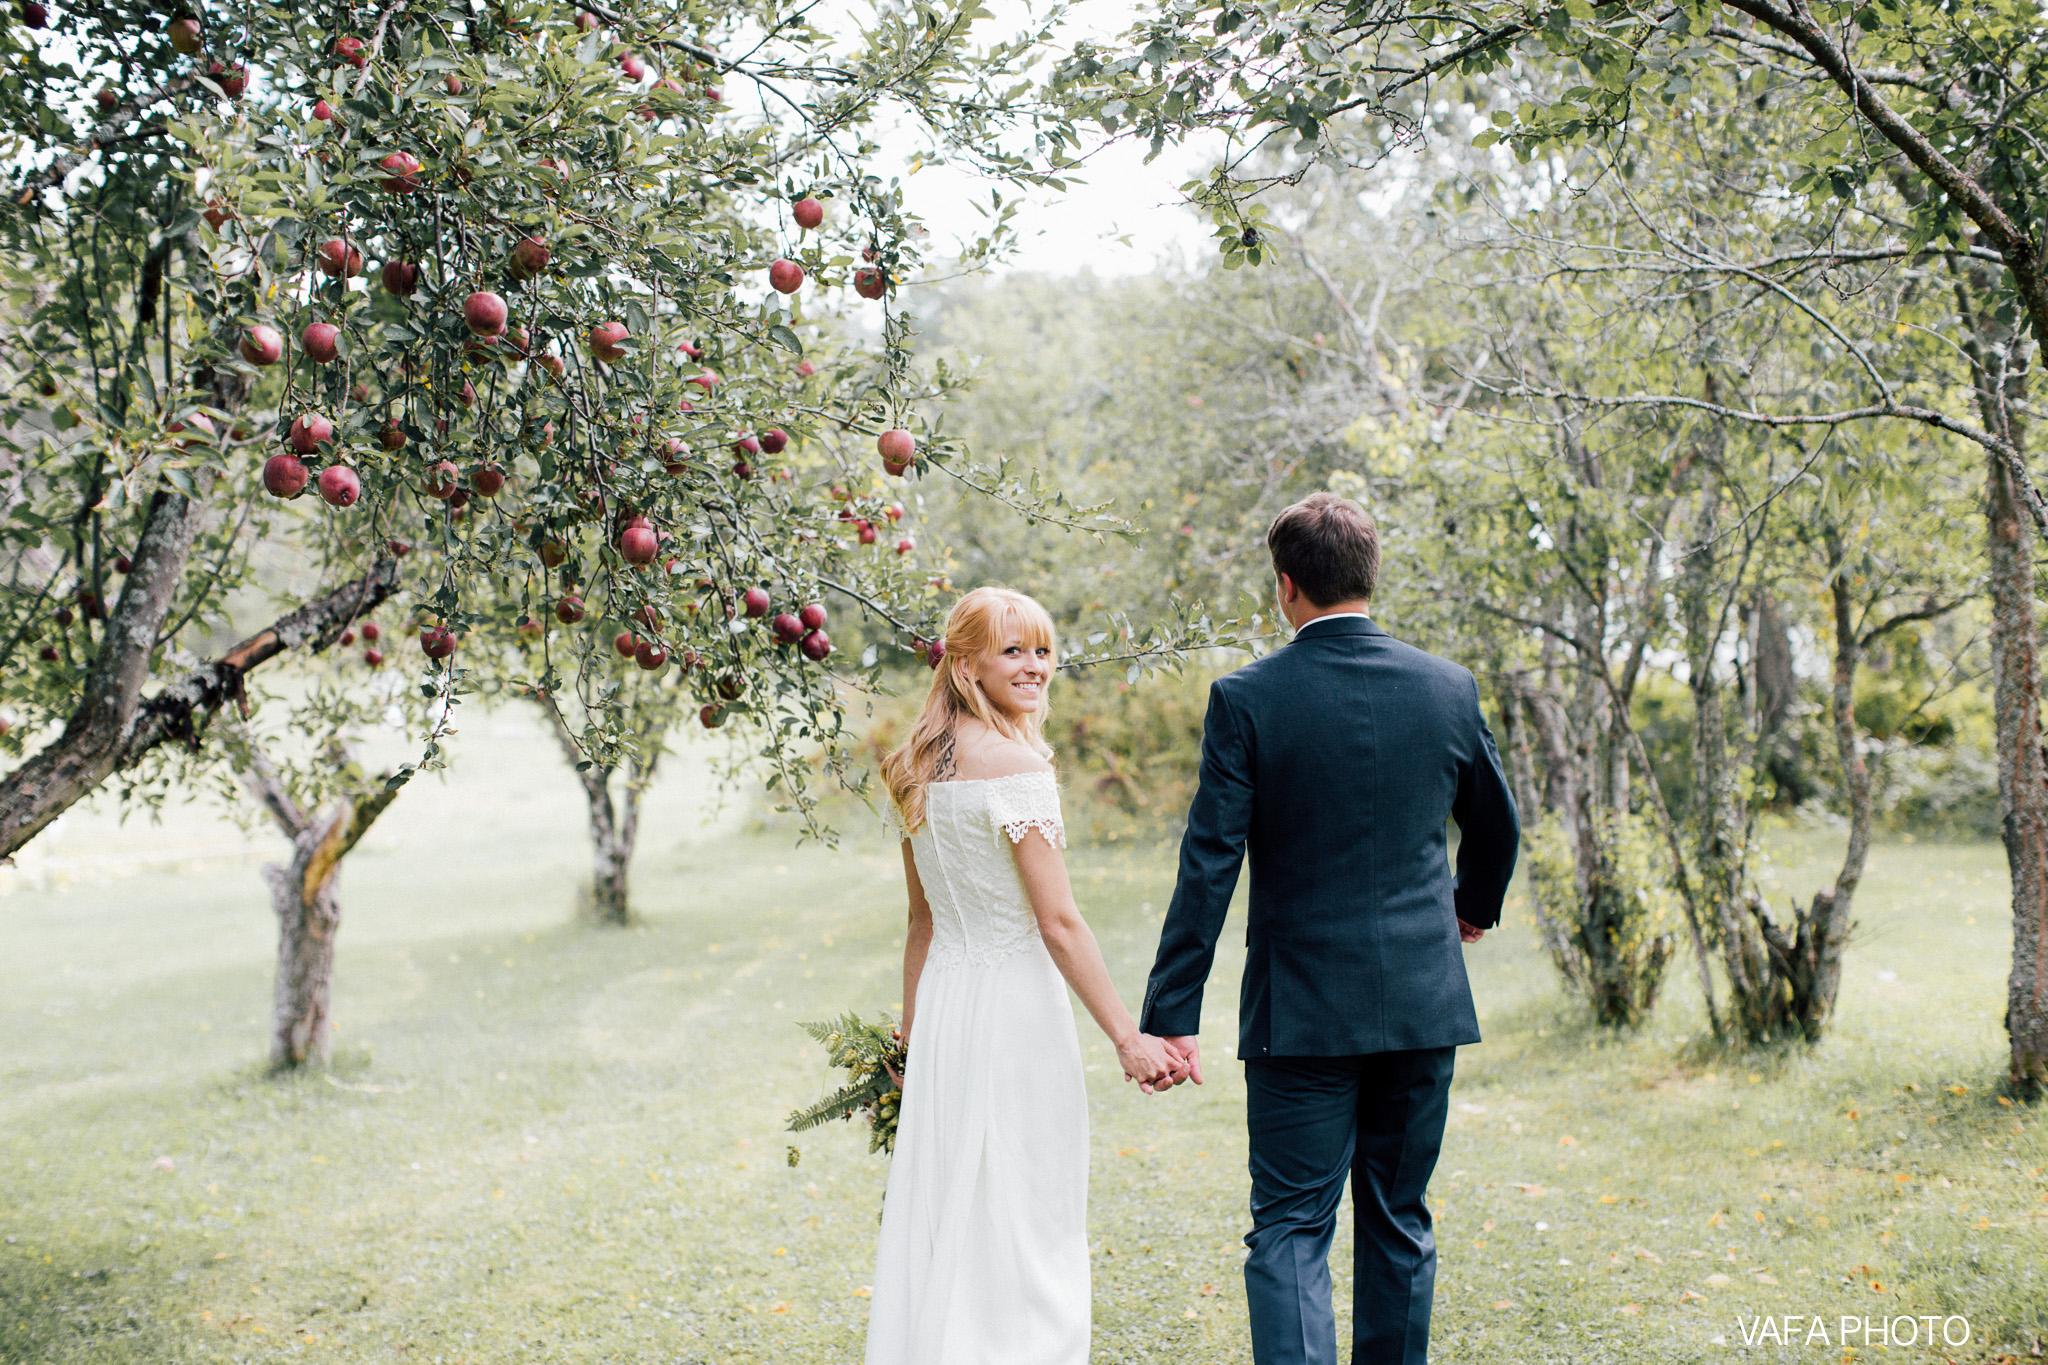 Belsolda-Farm-Wedding-Christy-Eric-Vafa-Photo-138.jpg